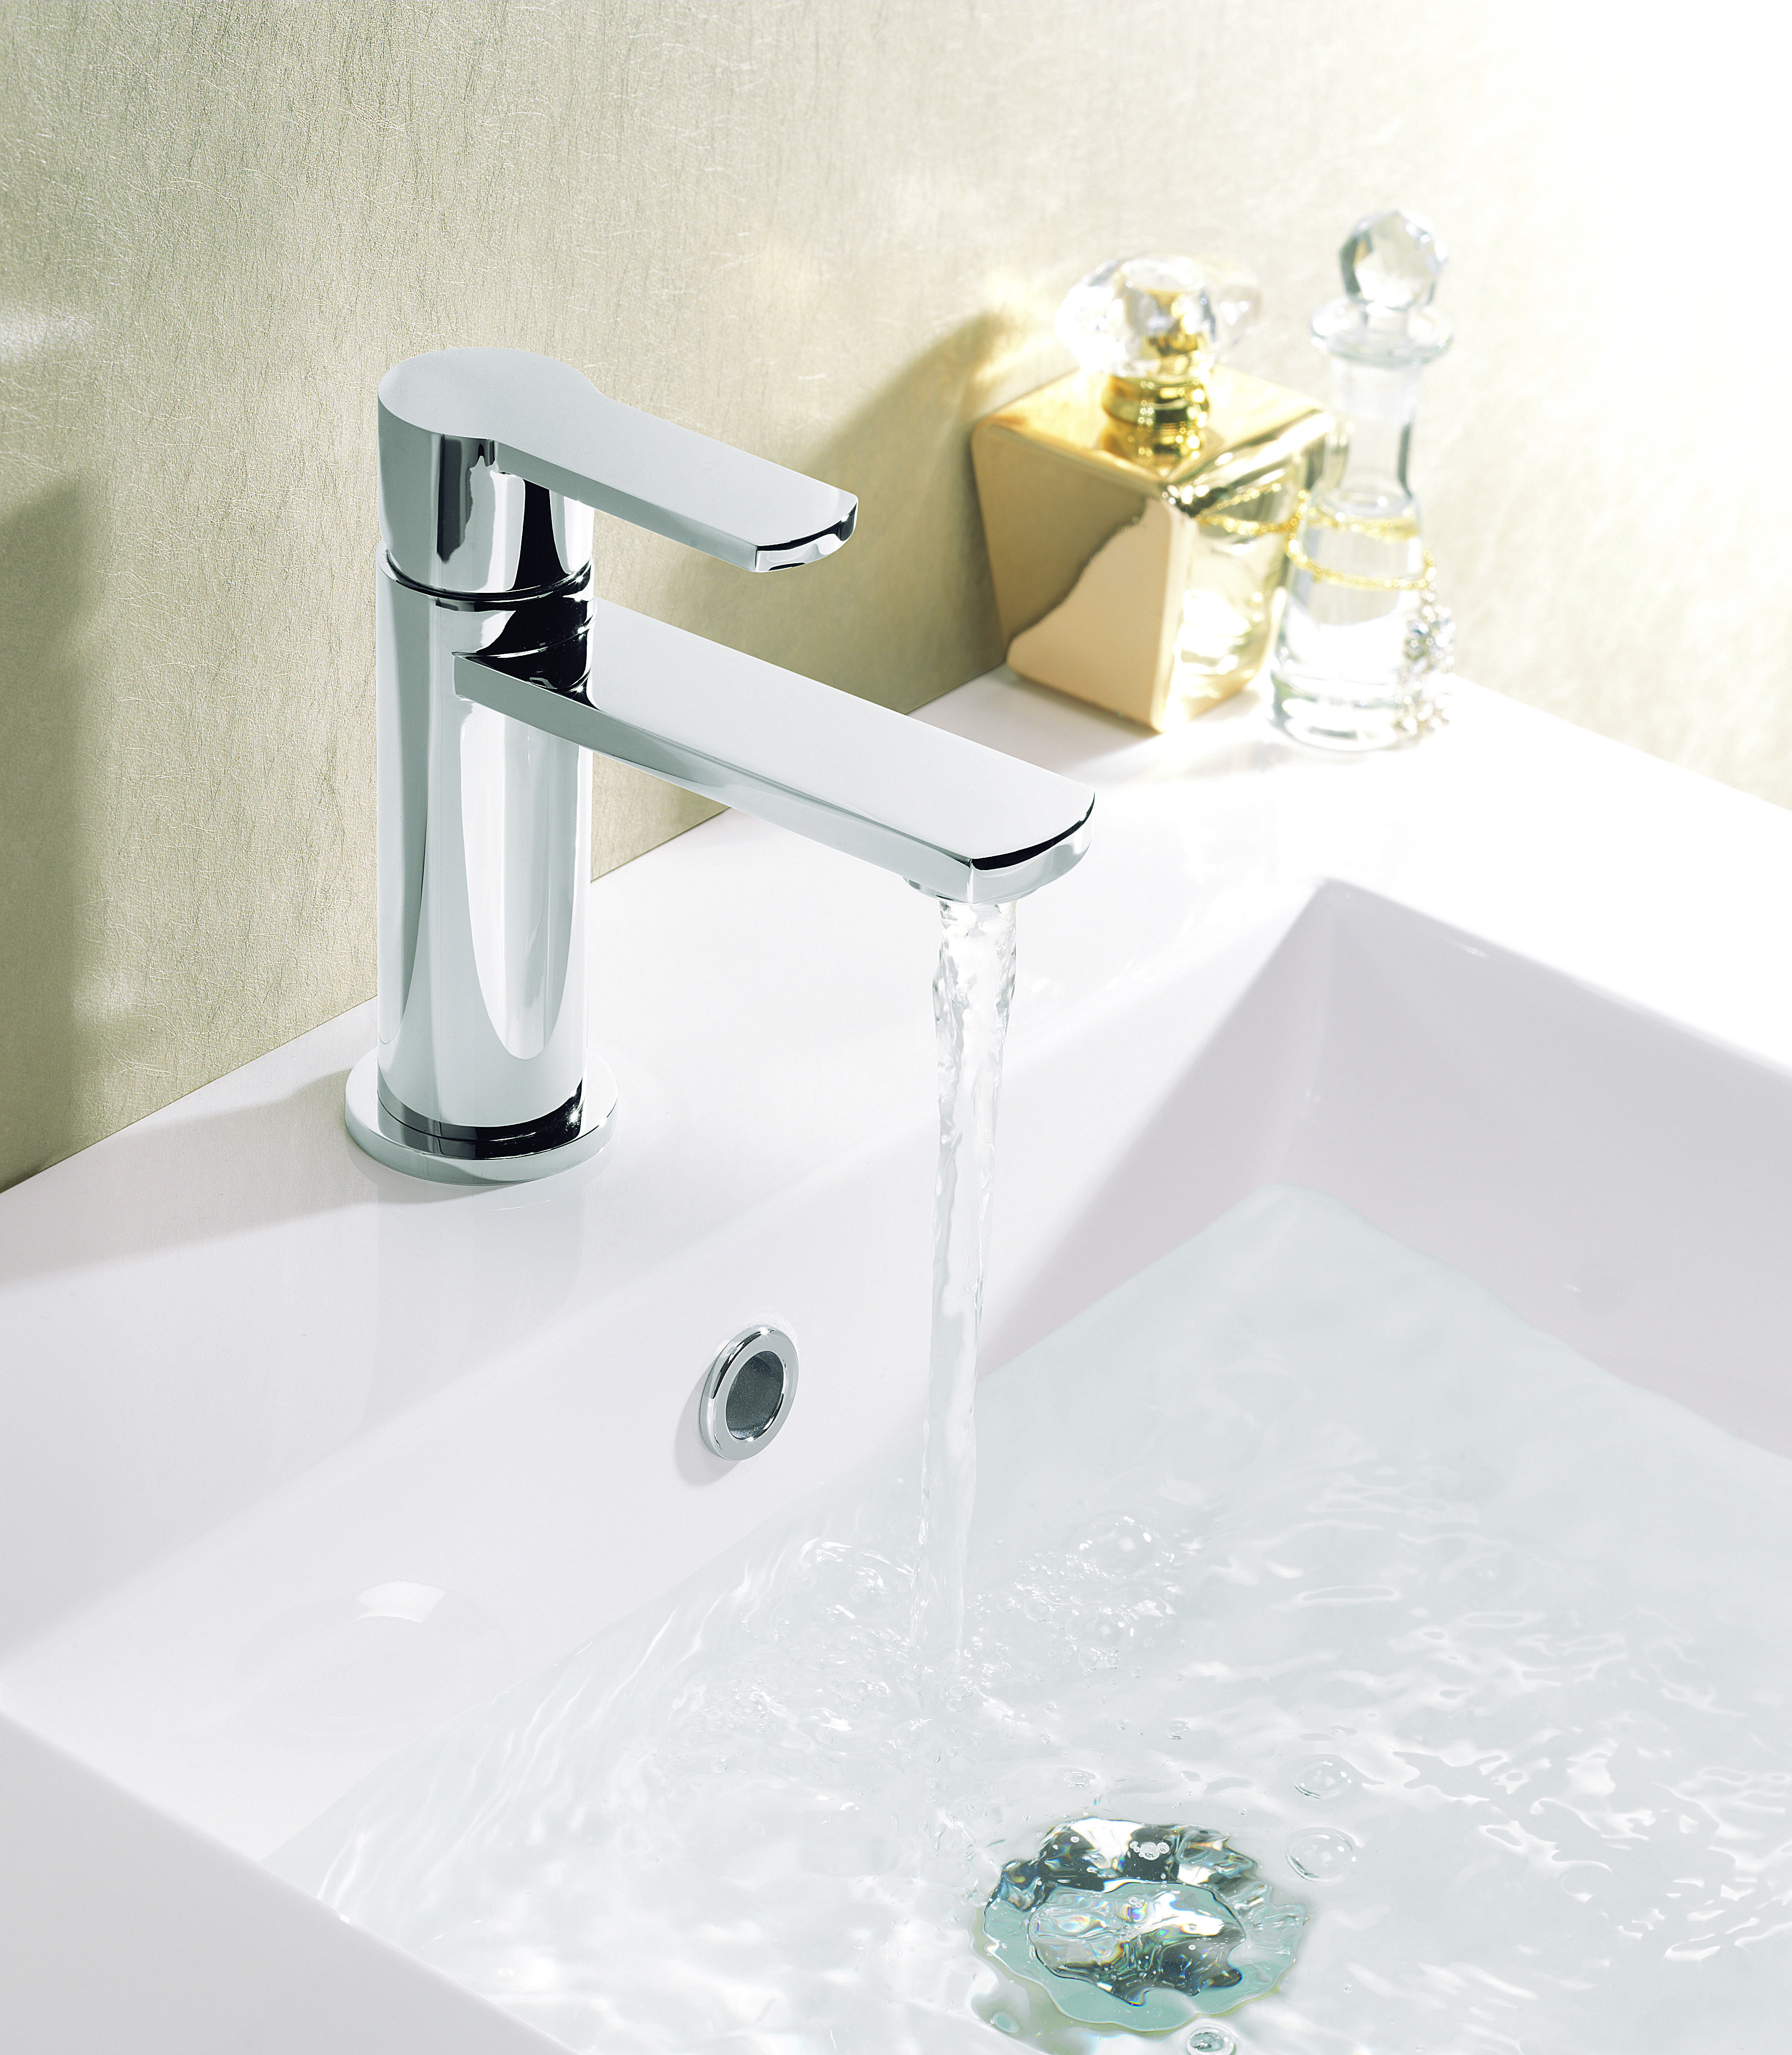 Wisp Single Hole Basin Faucet With Images Bathroom Basin Taps Faucet Basin